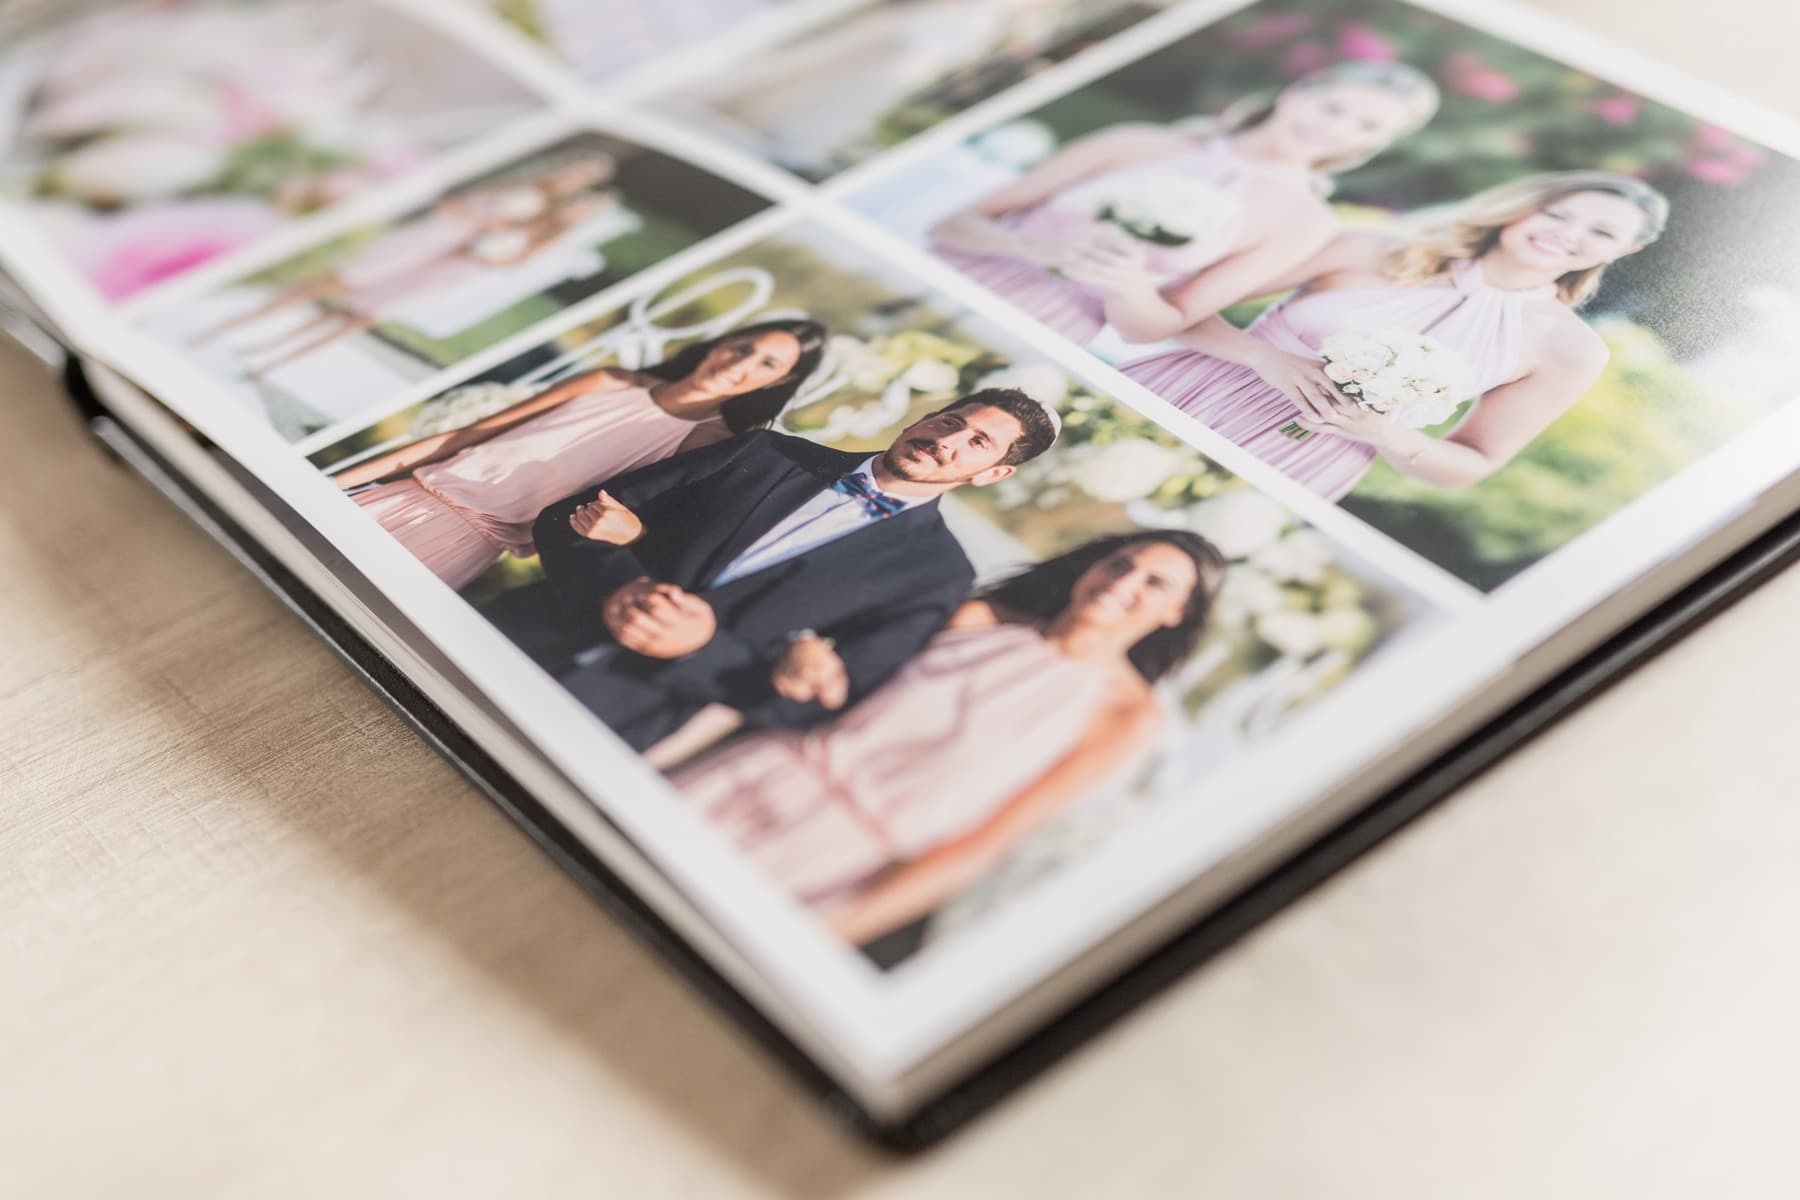 livre photos de mariage haut de gamme jd bascio photography. Black Bedroom Furniture Sets. Home Design Ideas